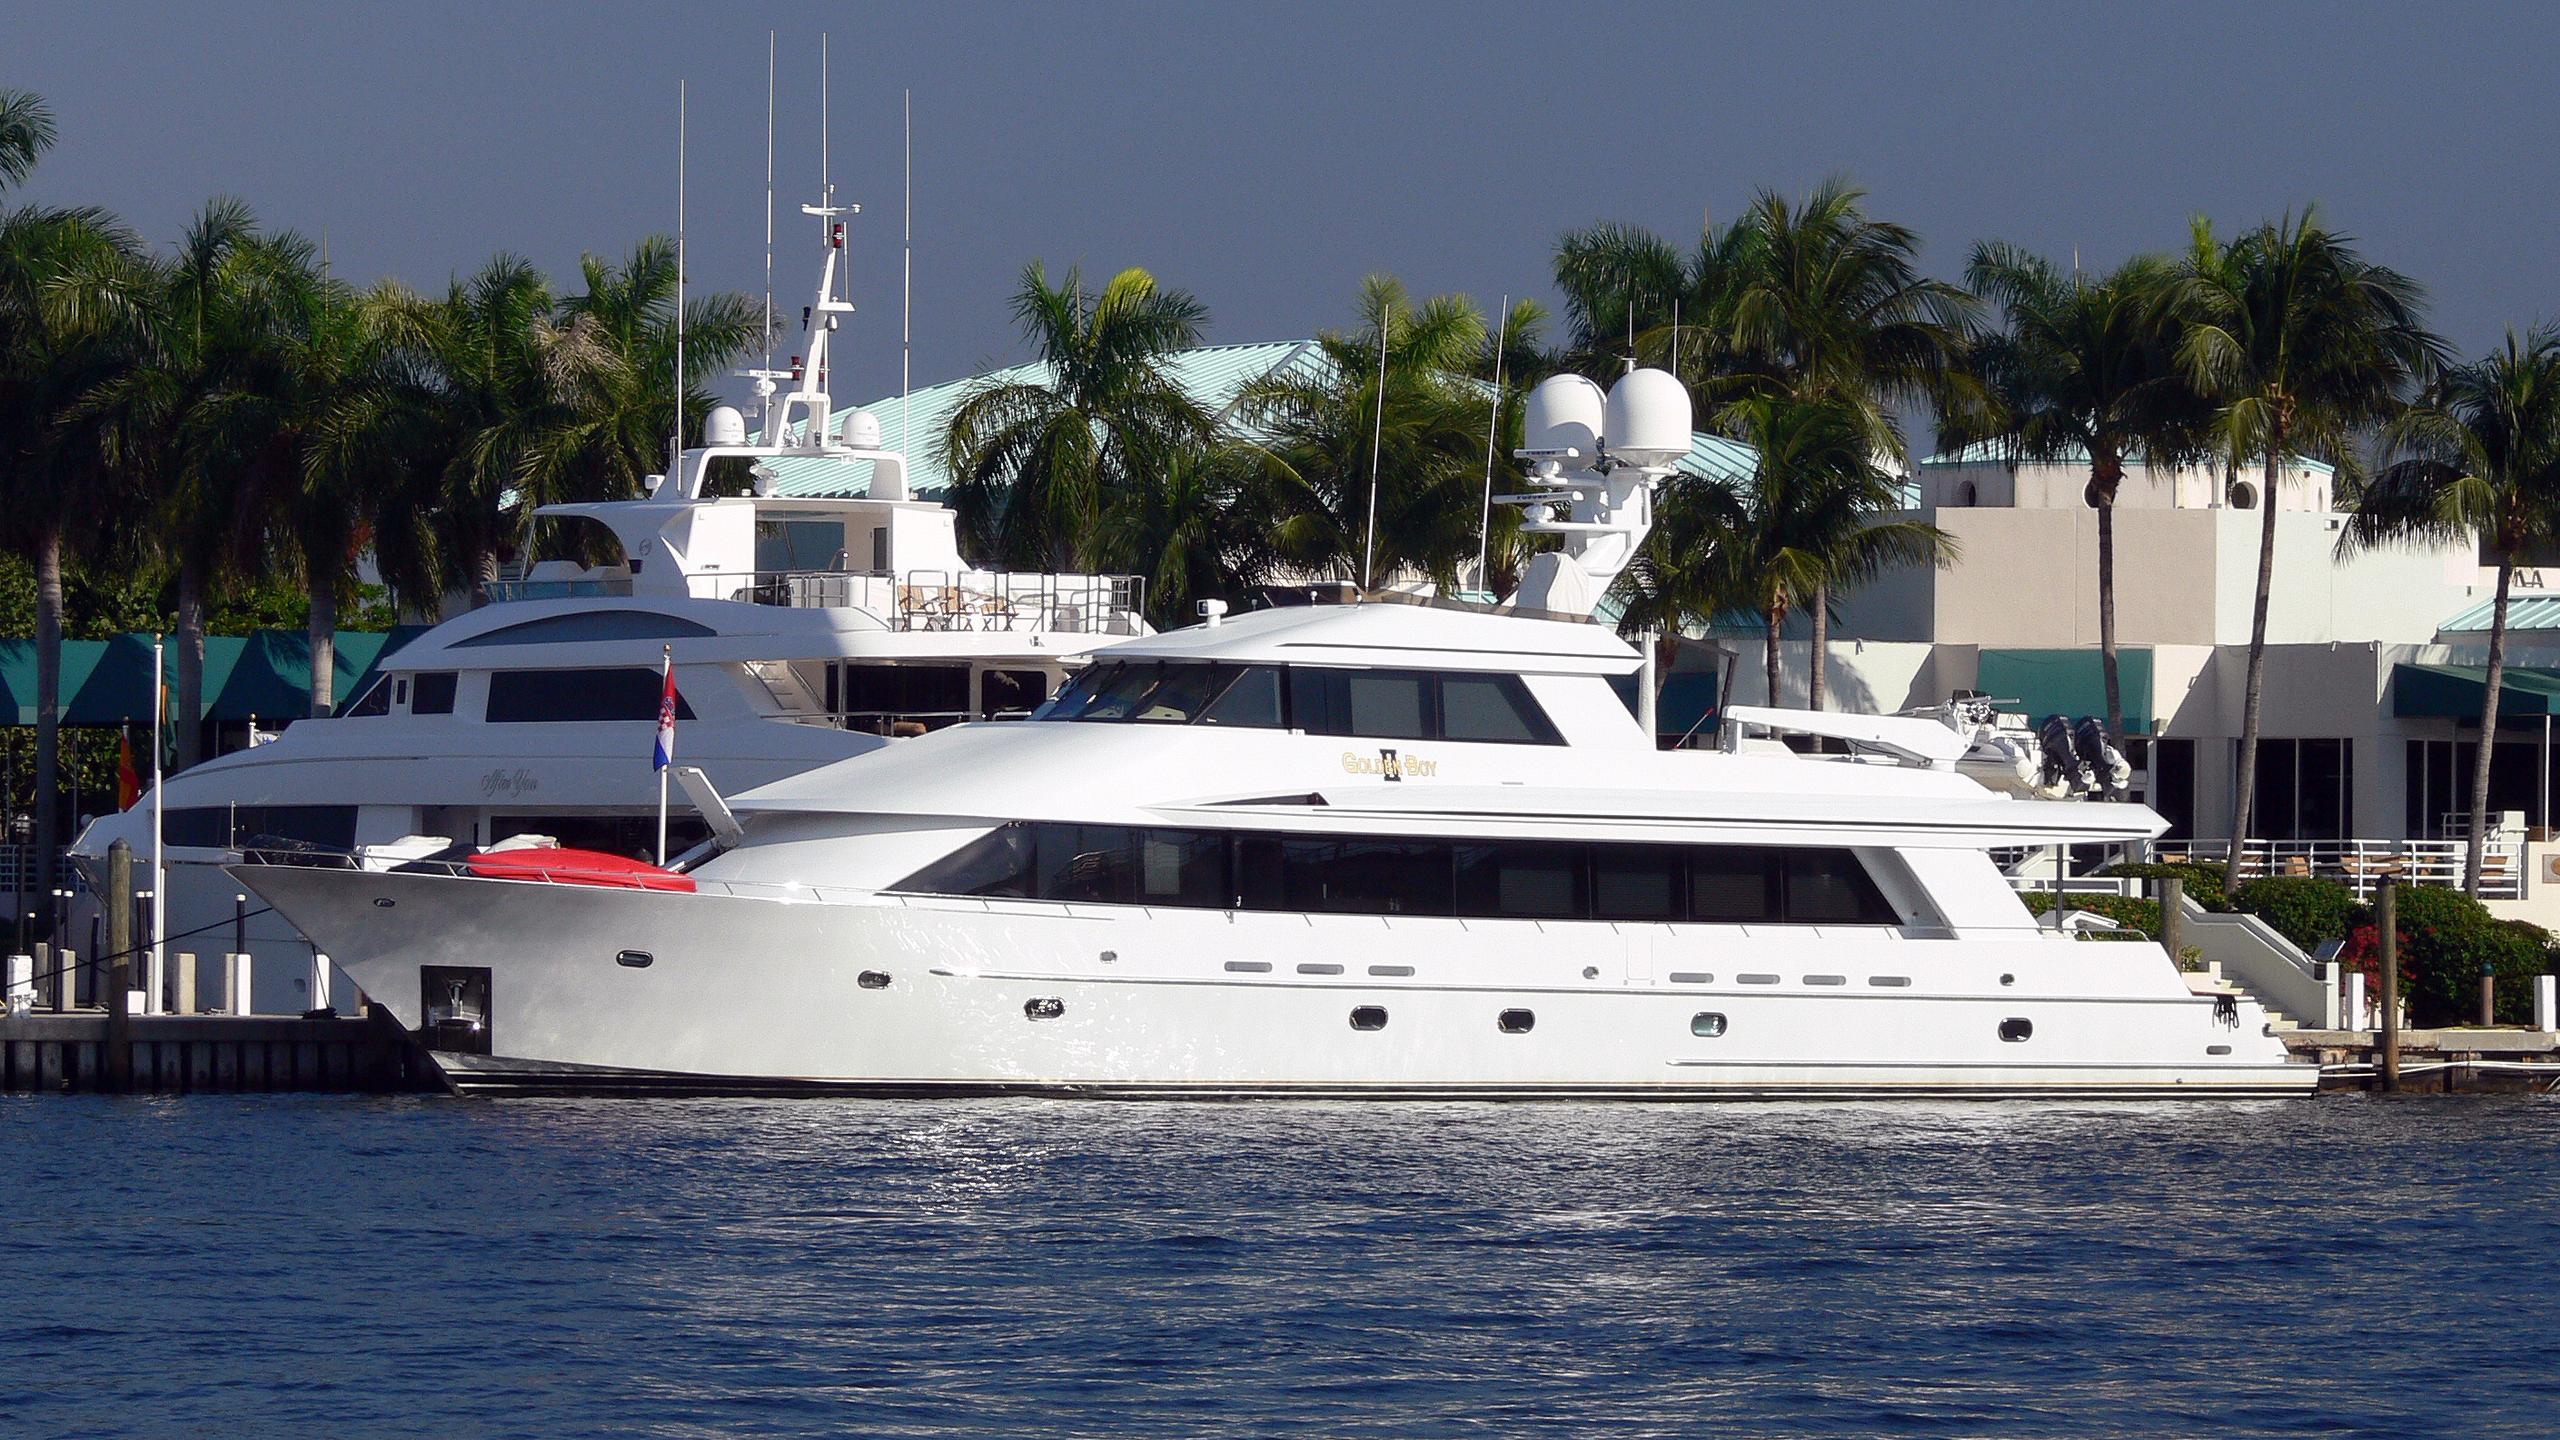 golden-boy-ii-motor-yacht-soverign-1998-35m-profile